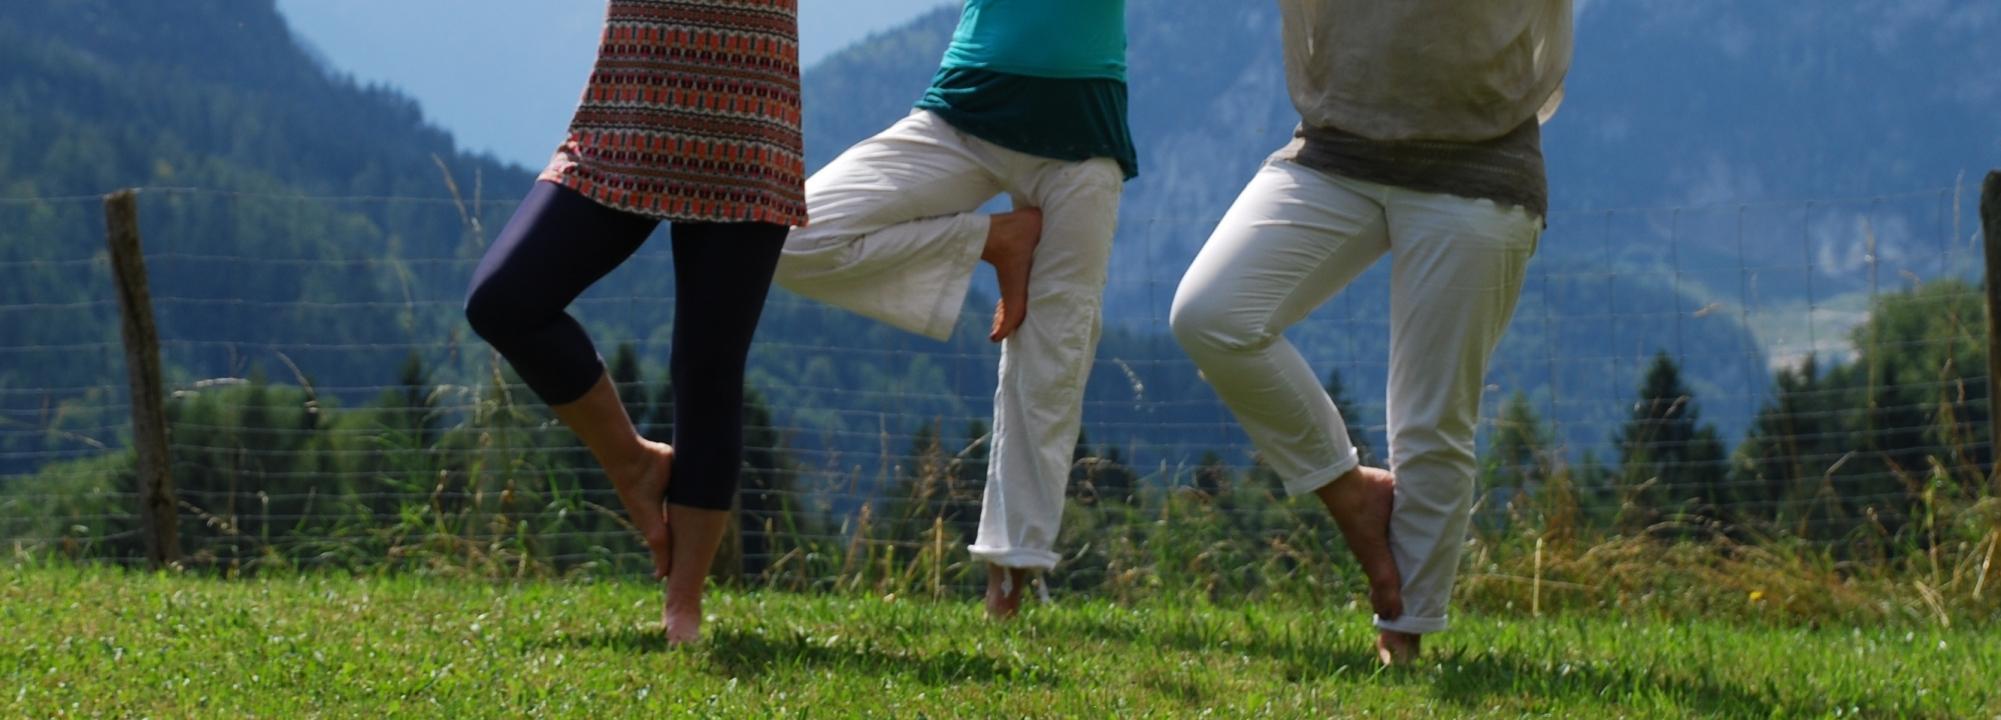 Yogaschule Carolin Flinker Baum Sommeryoga